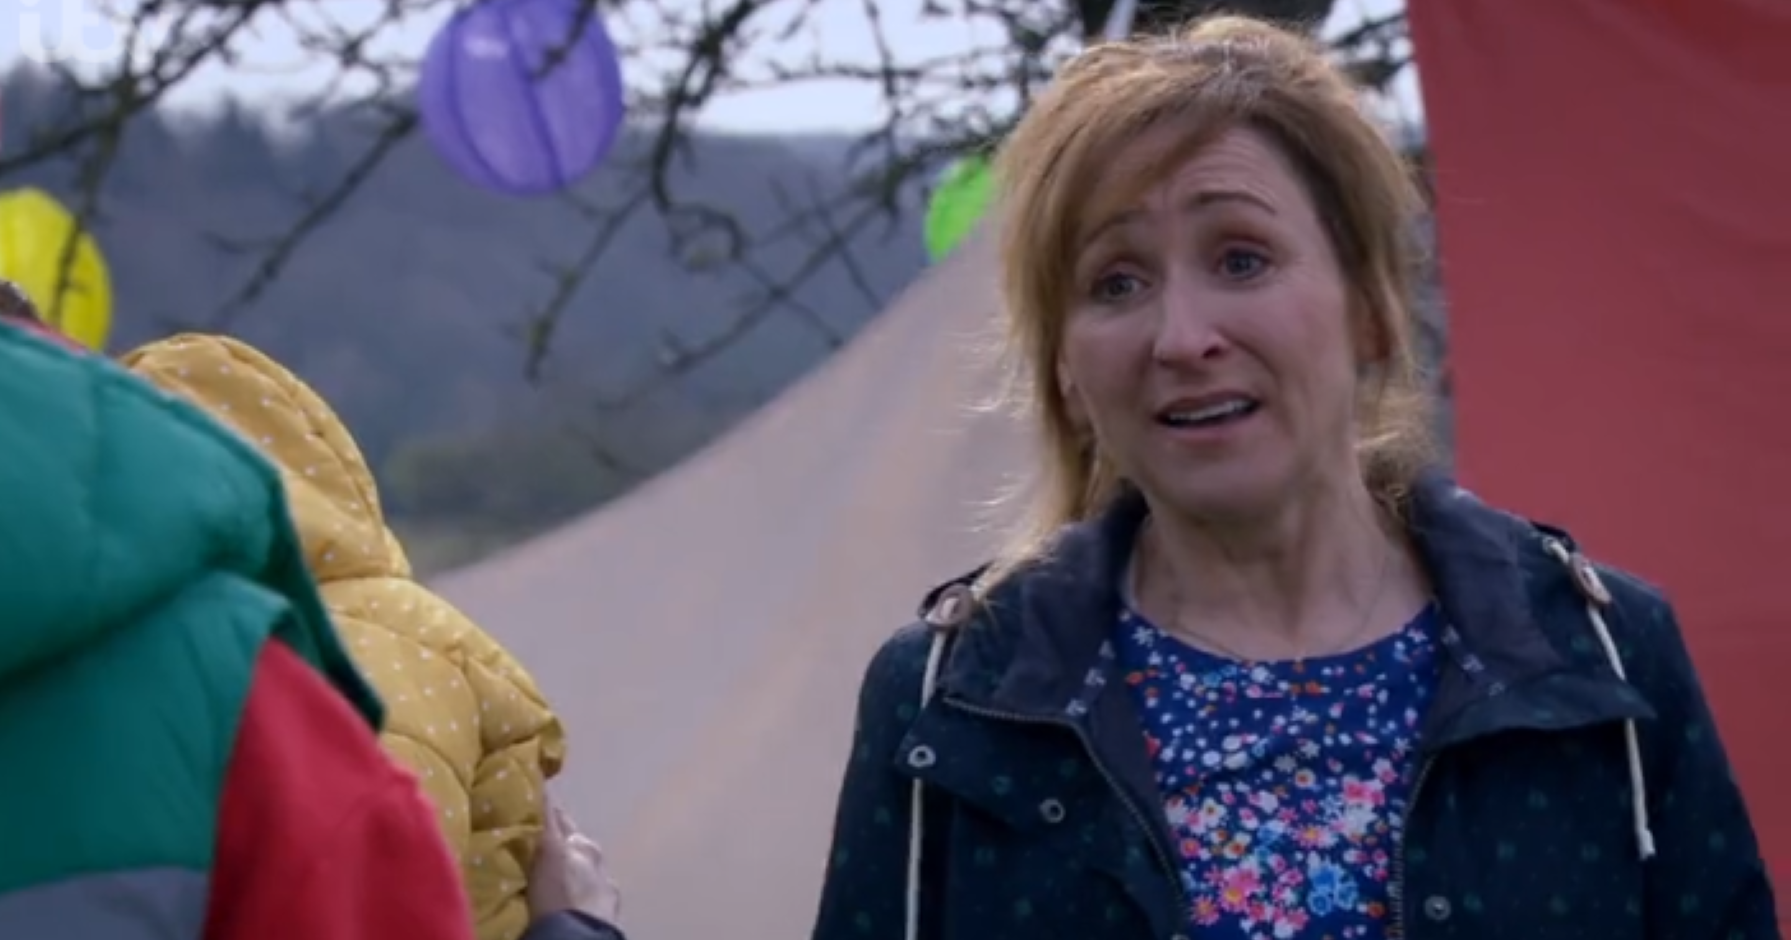 Emmerdale viewers blame Laurel for Arthur's bad behaviour